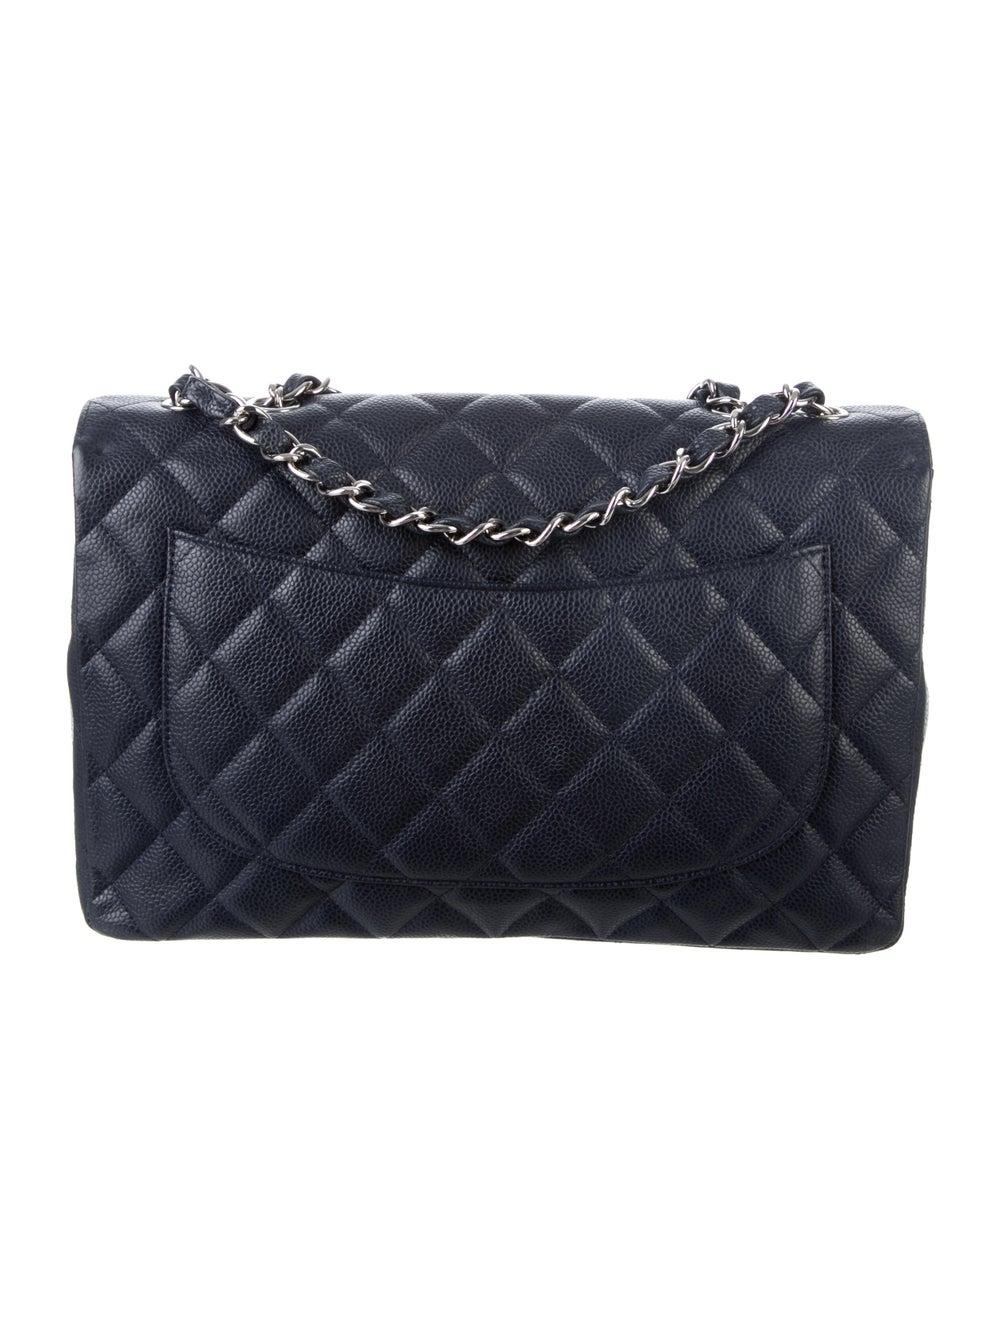 Chanel Jumbo Single Flap Bag Blue - image 4